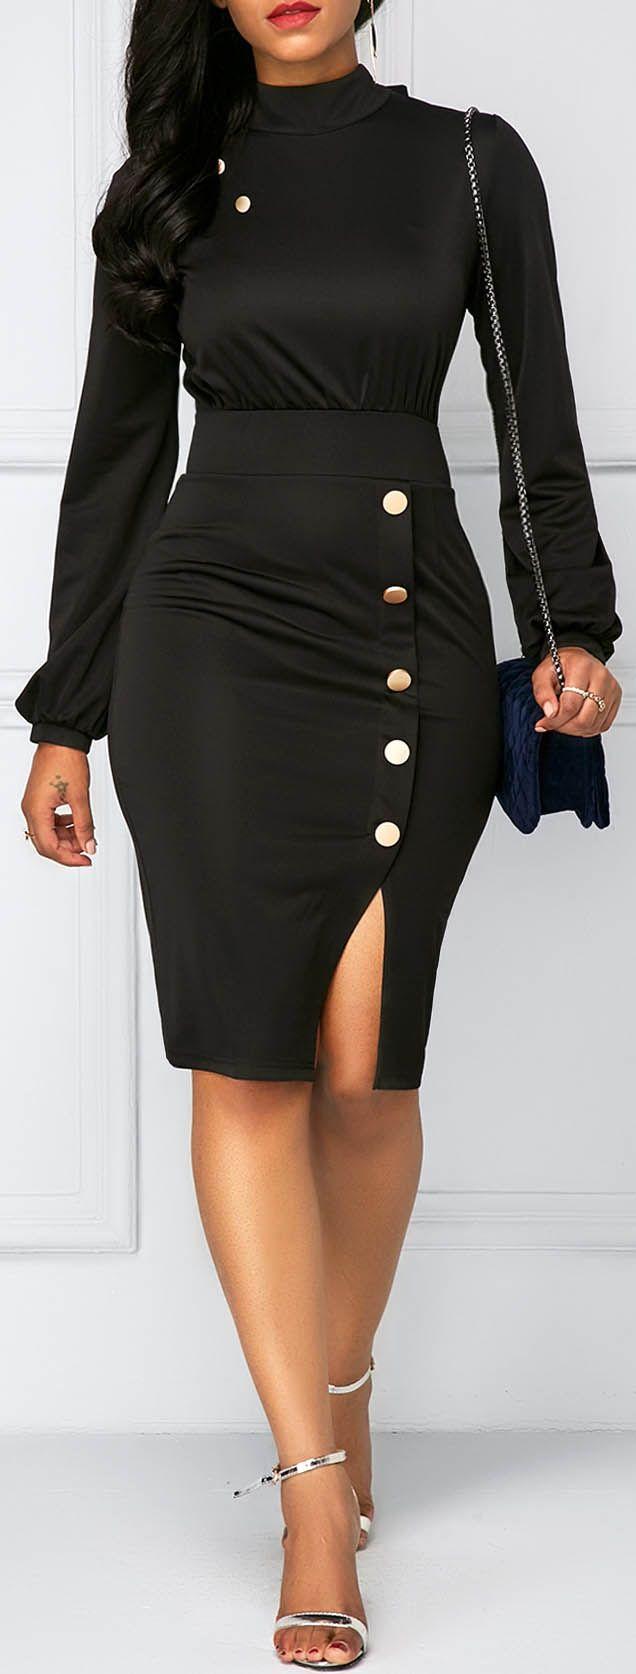 Long Sleeve Button Decor Sheath Dress.